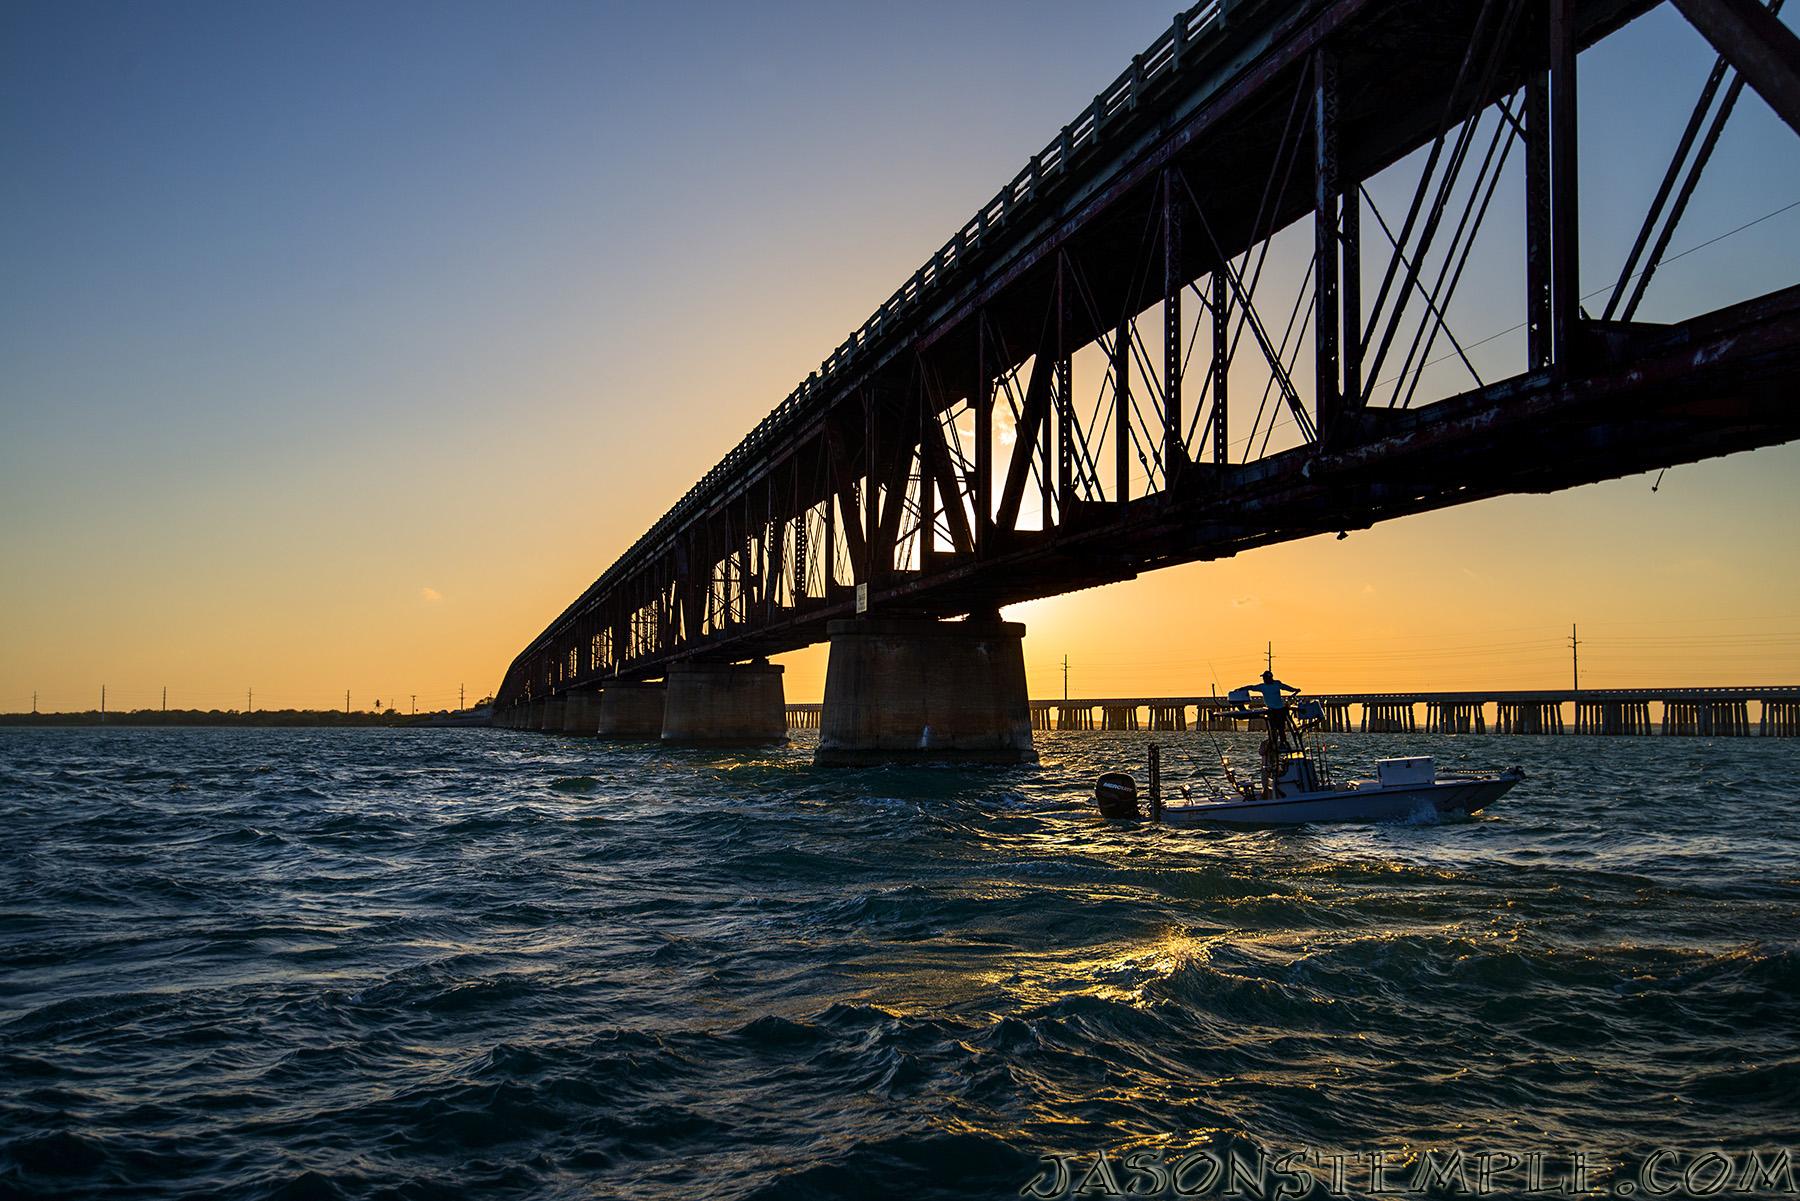 Sunset at Bahia Honda Bridge after the encounter. nikon d800, 35mm, f/5.0, 1/800 sec